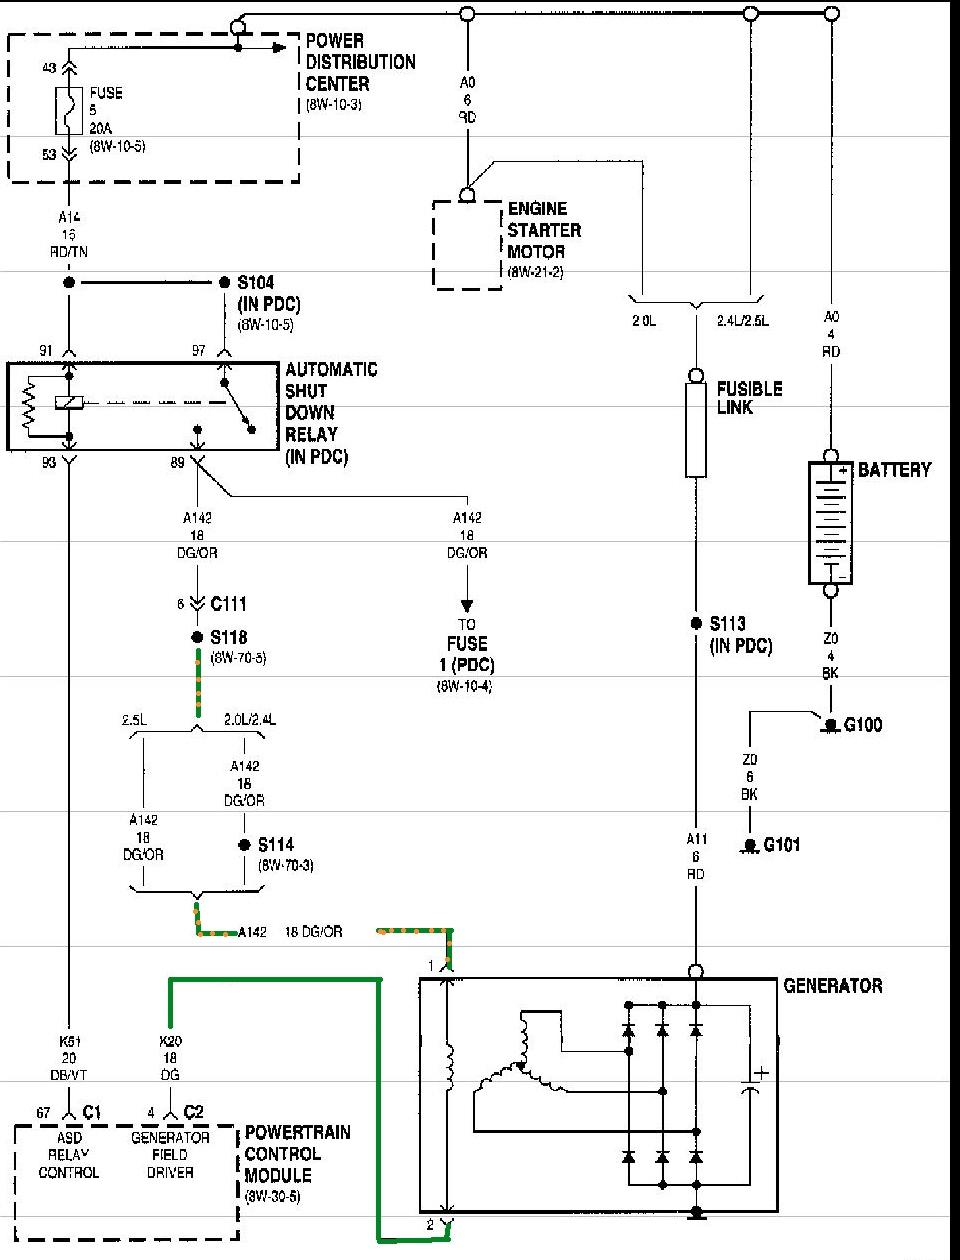 Alternator Wiring Diagram Ford Ranchero Get Free Image About Wiring